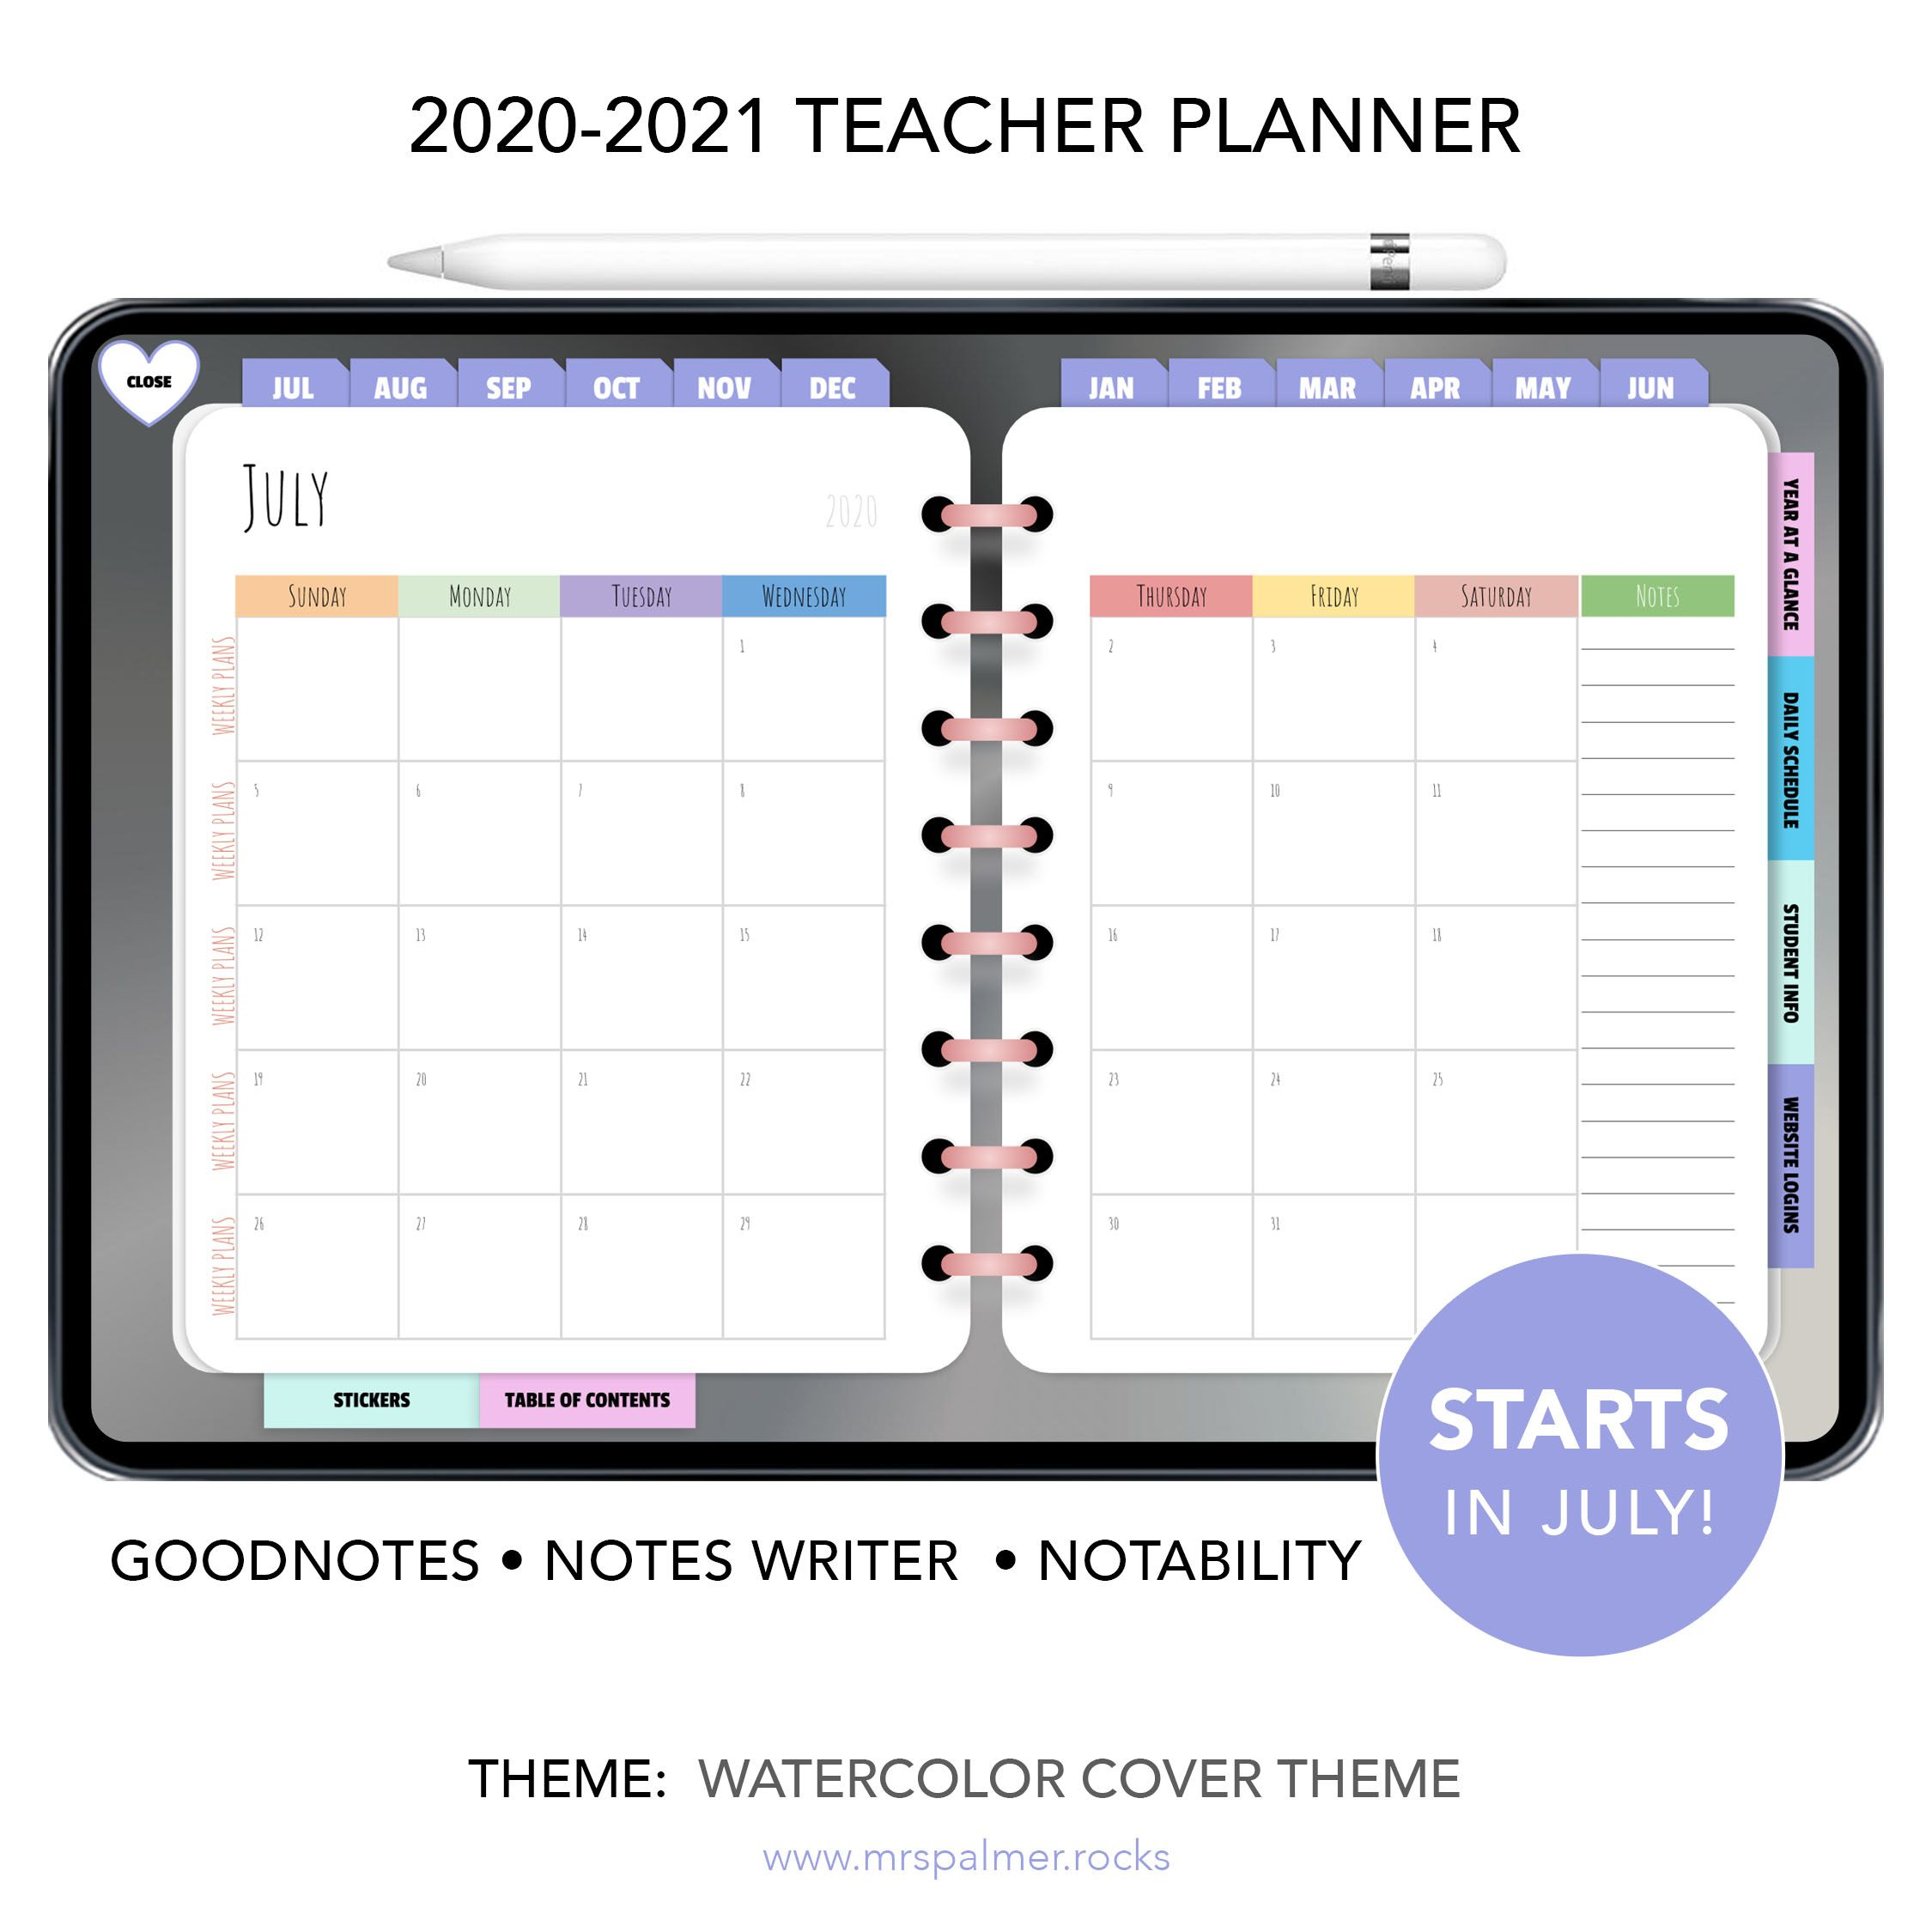 2020 / 2021 Digital Teacher Planner (Watercolor Cover